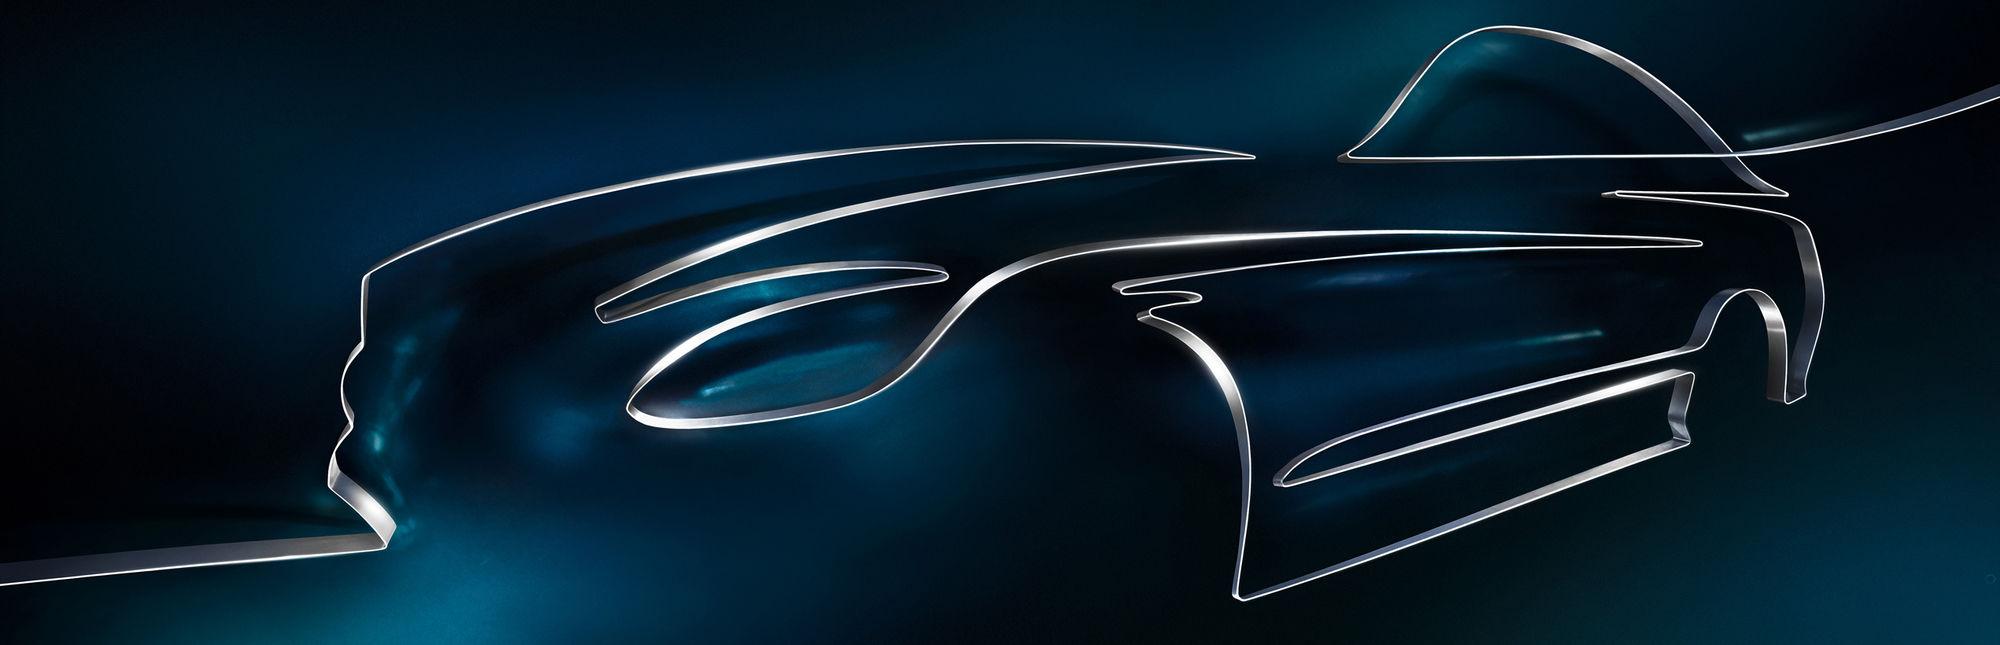 BIRGIT STöVER: Johann COHRS for Daimler